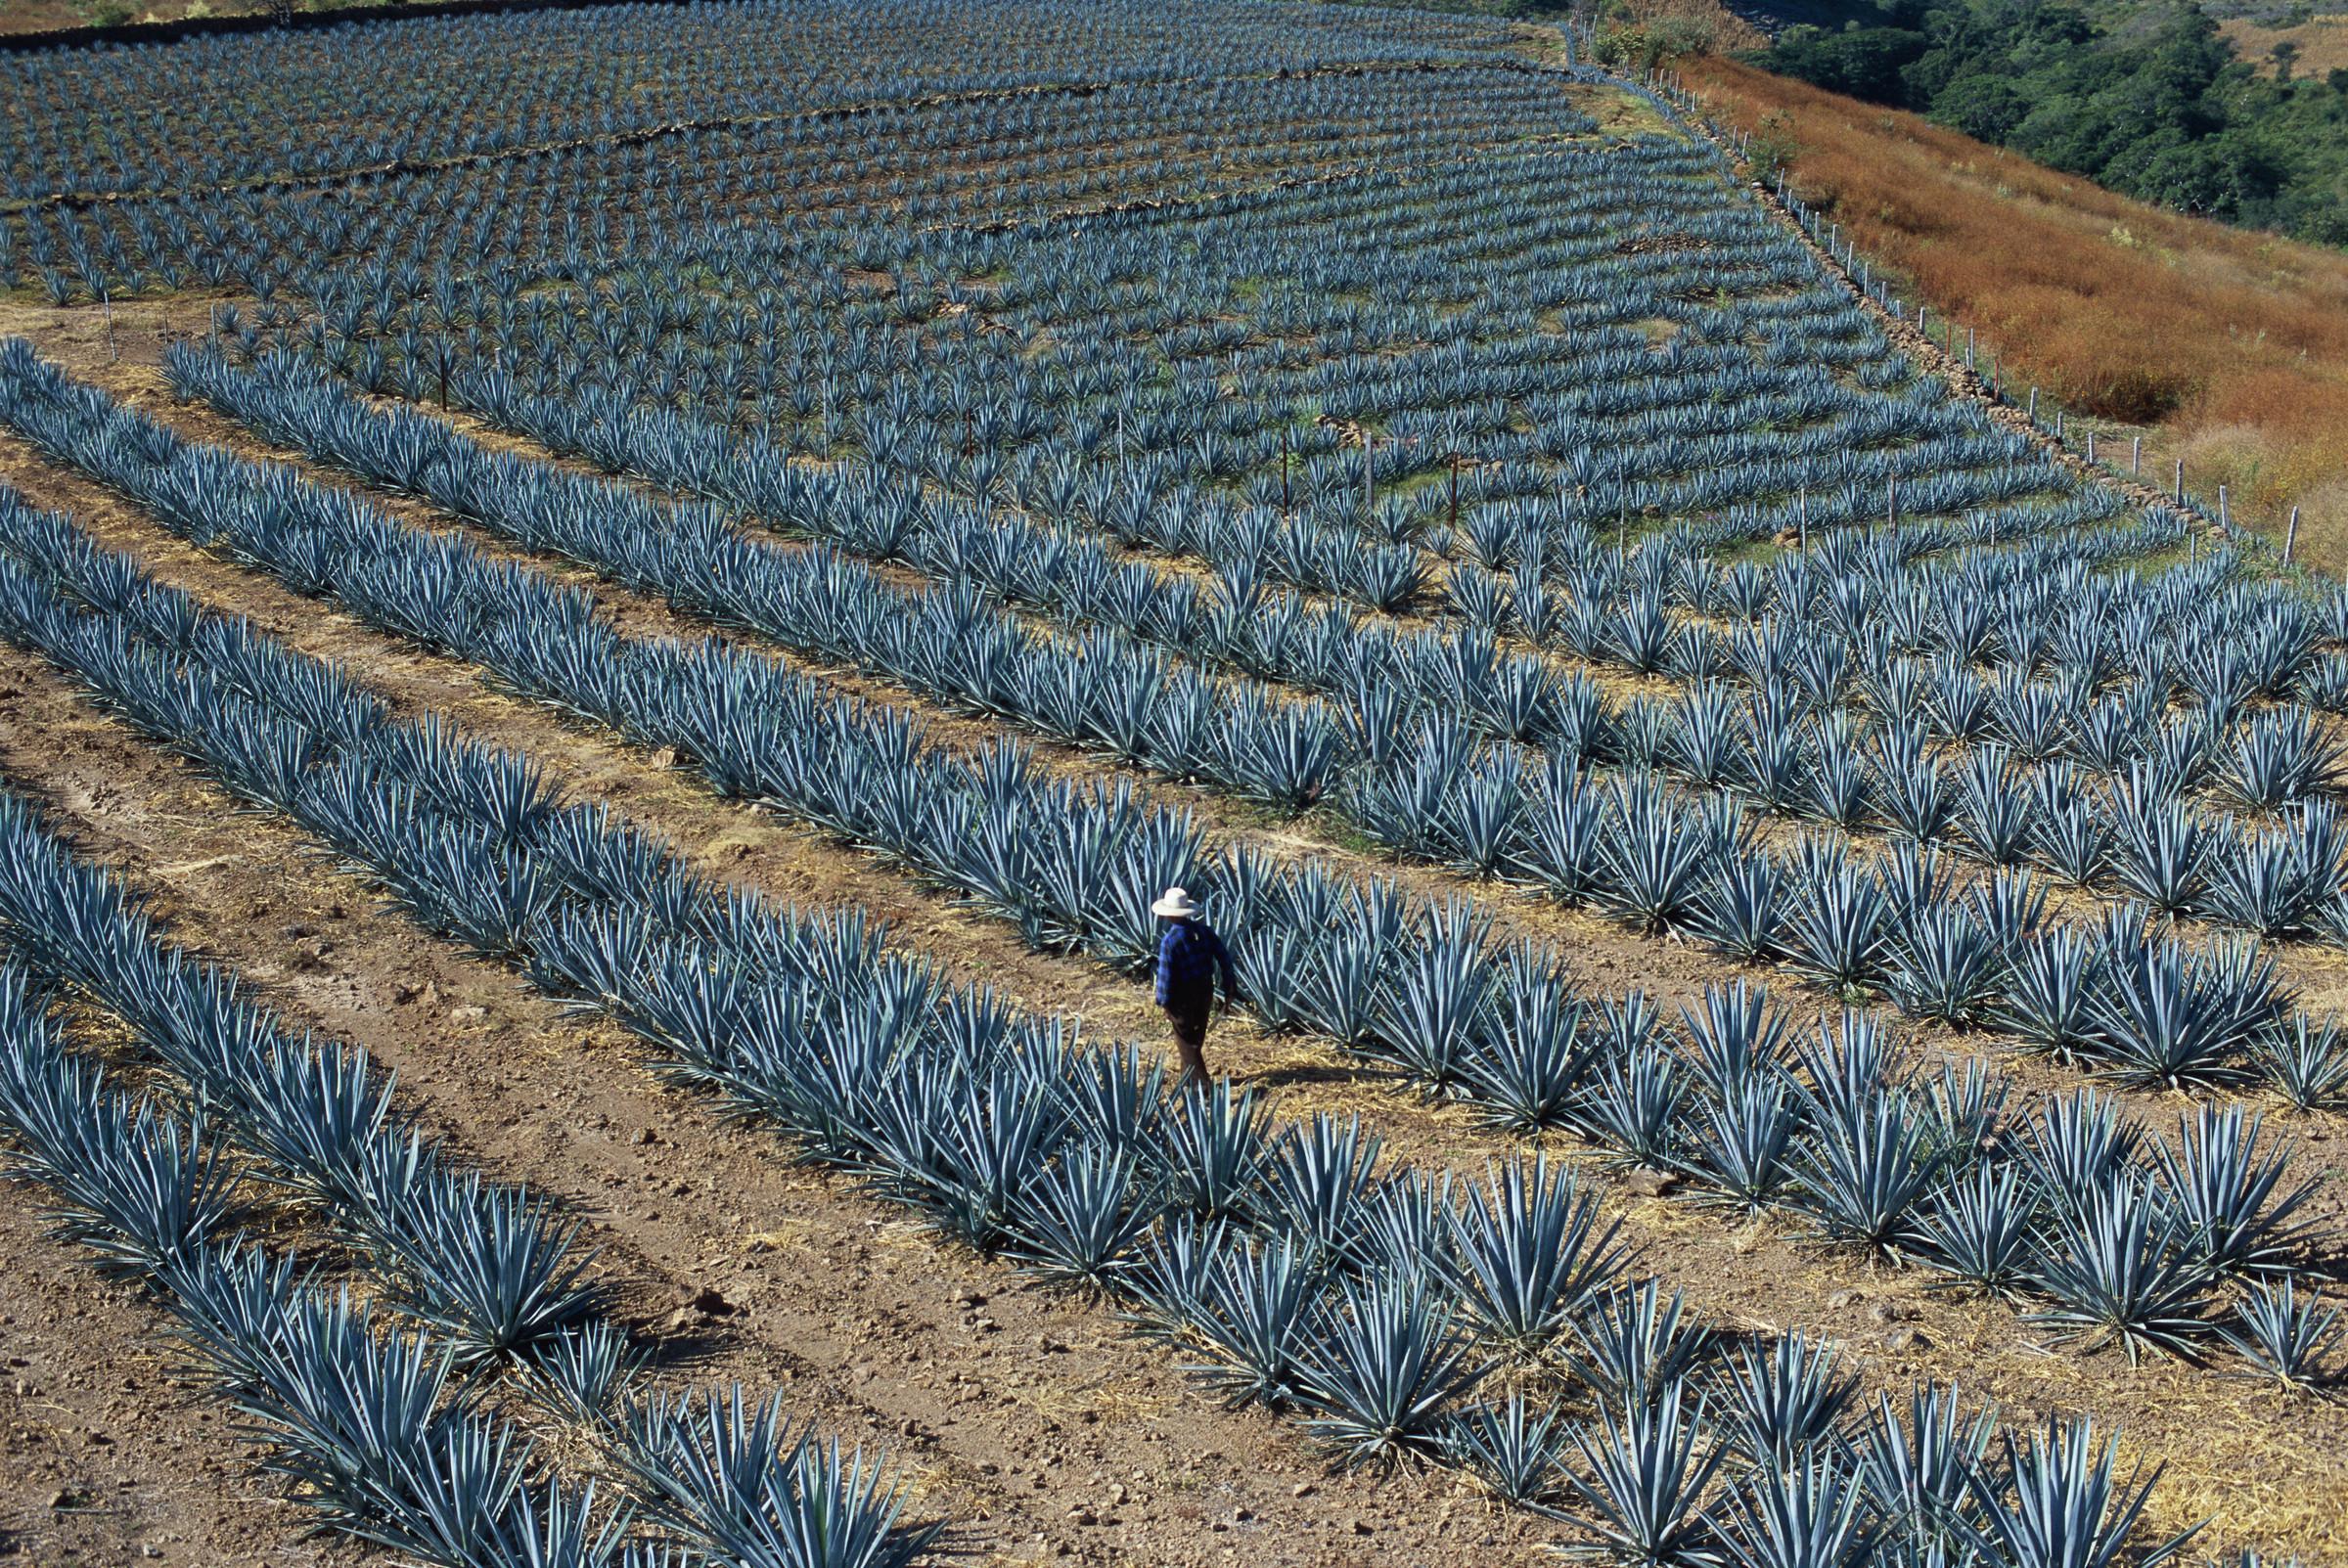 Man walking in agave plant's wide fields.